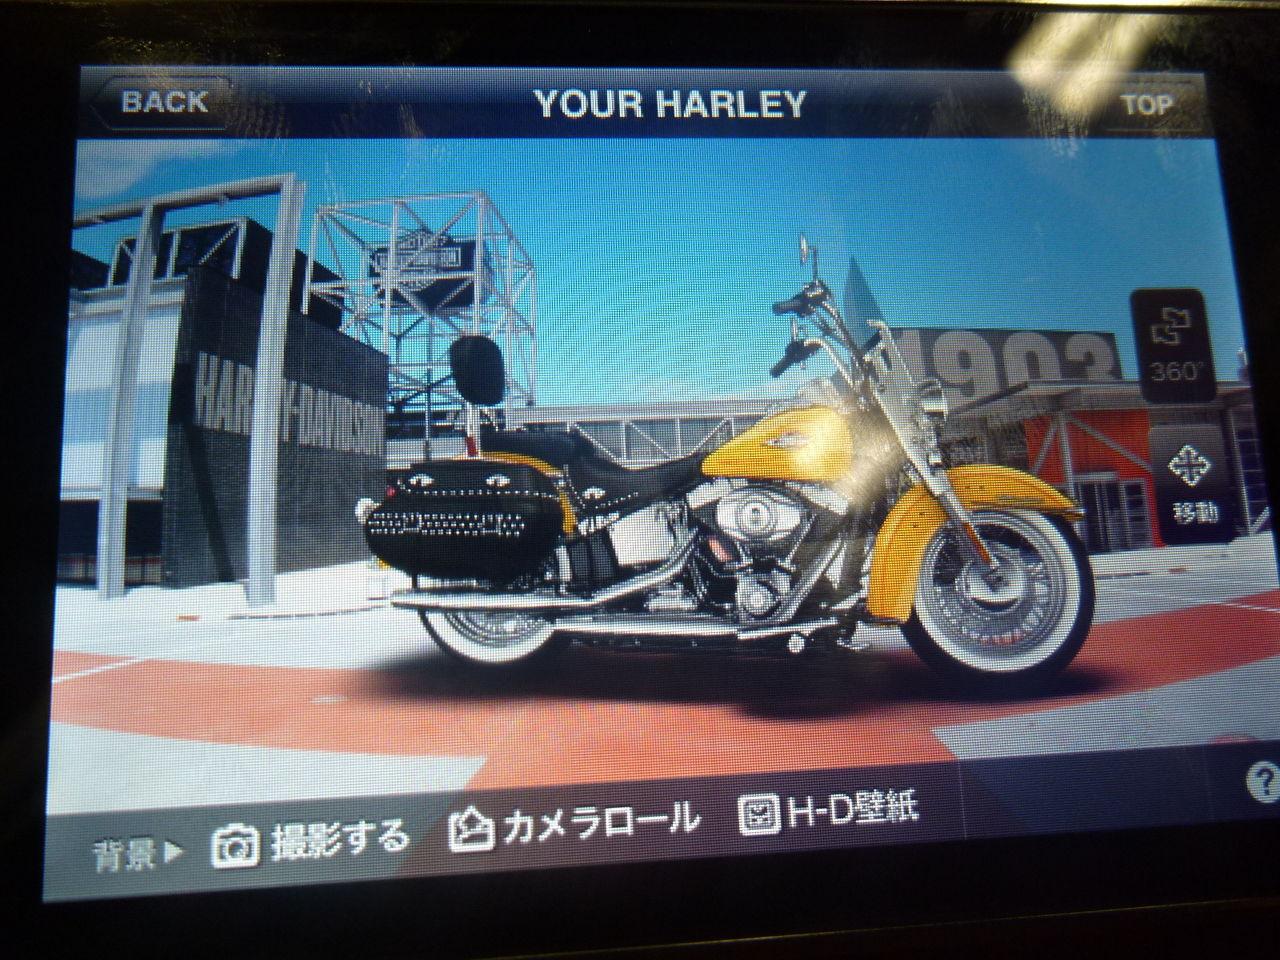 Iphone用ハーレーダビッドソン公式アプリ Harley Davidson Sakurai Blog 旧称 ワークスサクライ